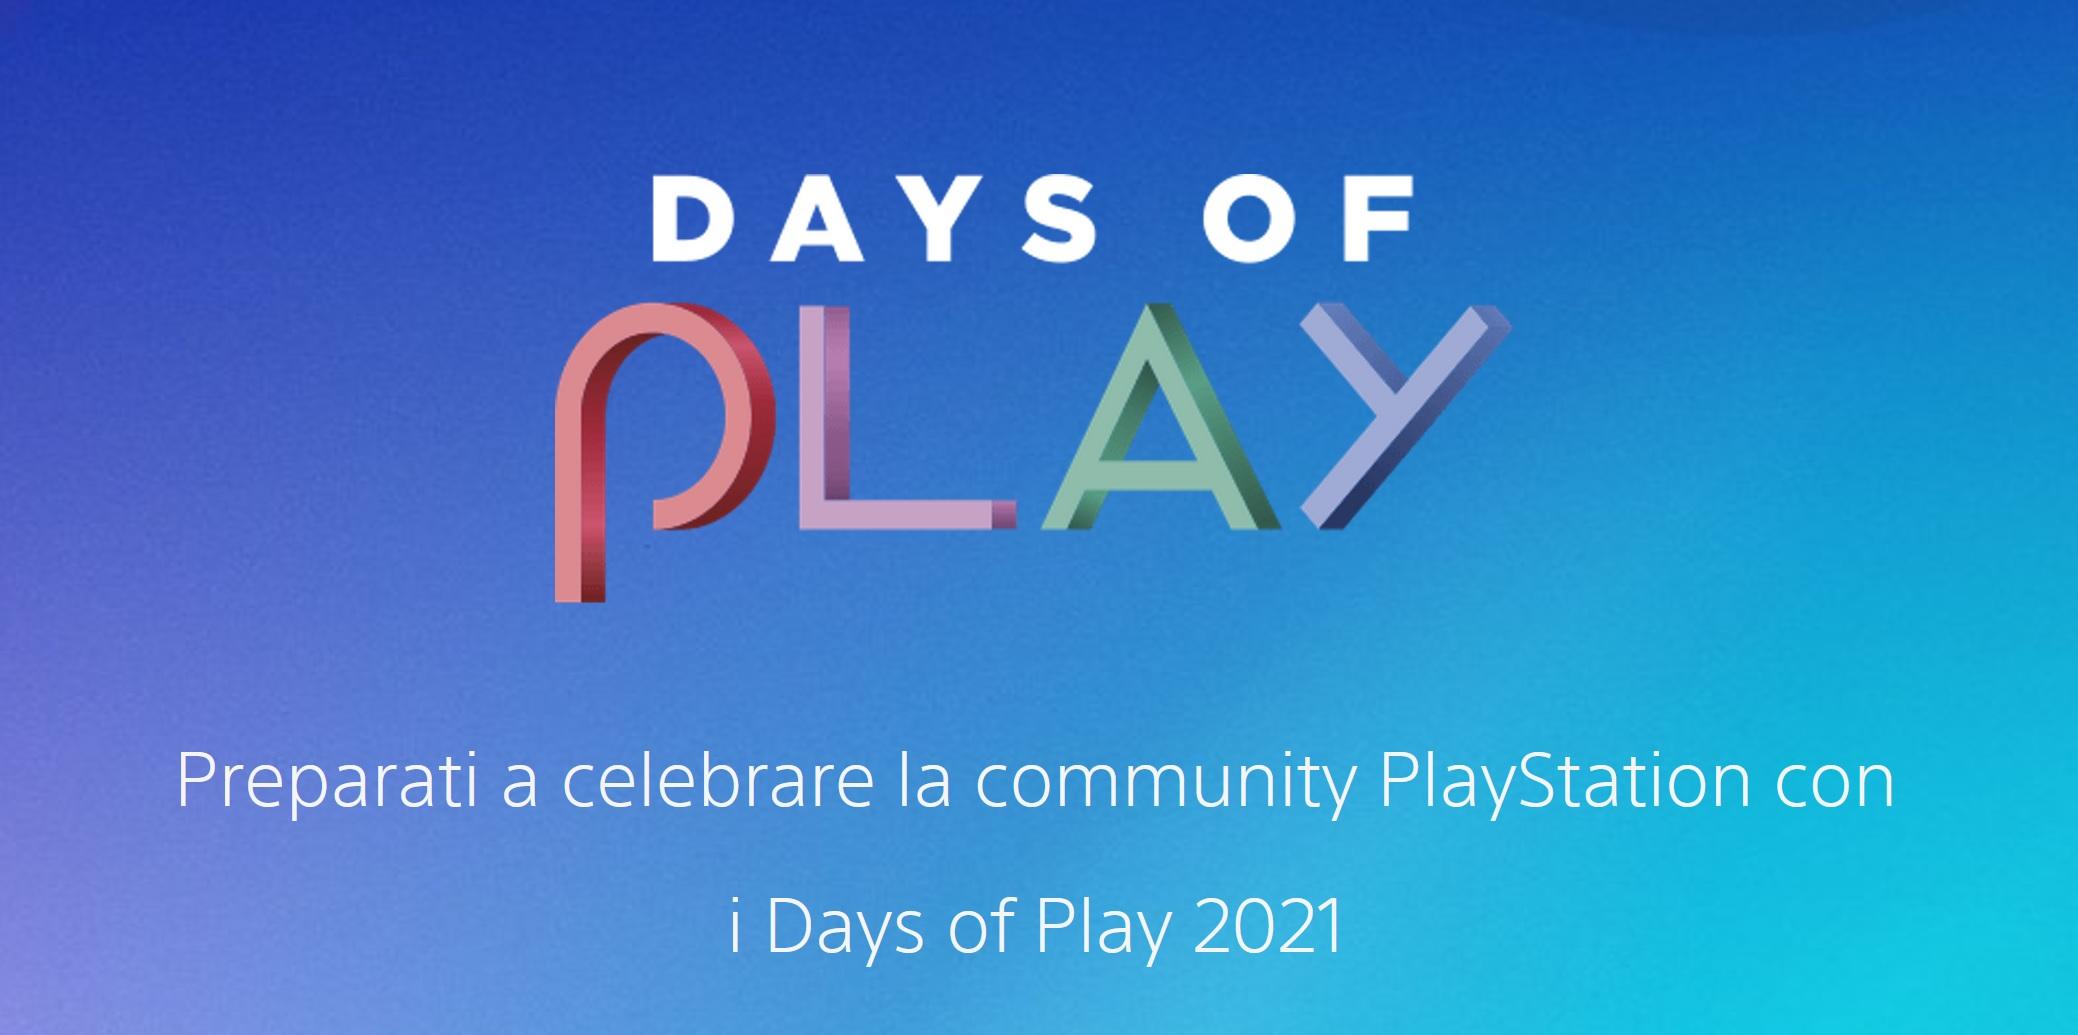 Days of Play 2021: tante offerte per la community PlayStation